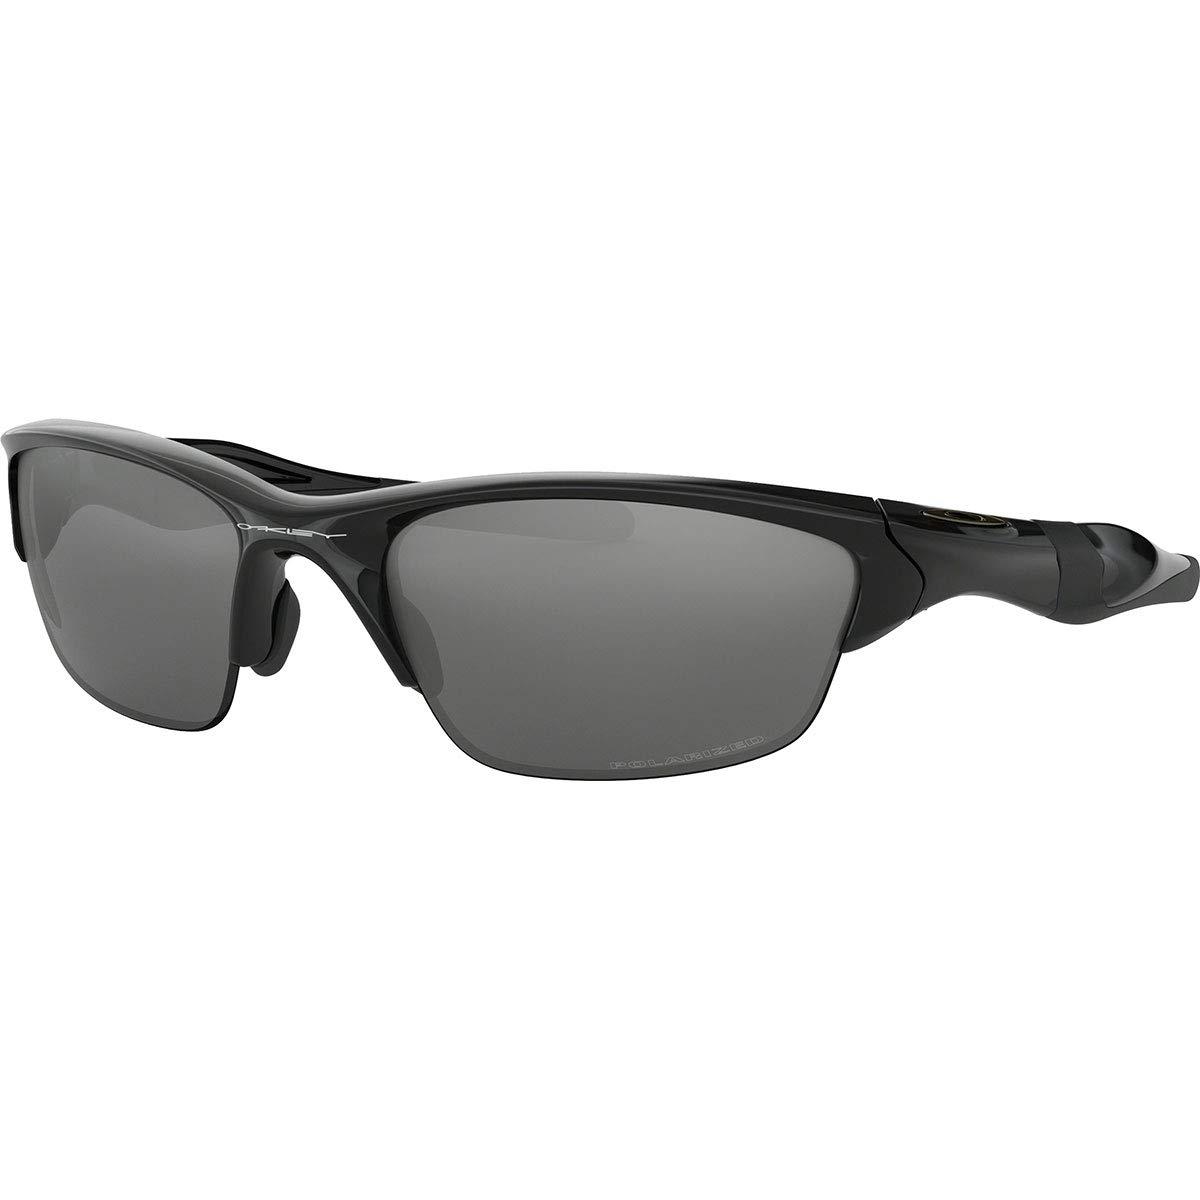 Oakley Men's Half Jacket 2.0 Sunglasses,OS,Polished Black/Black Iridium by Oakley